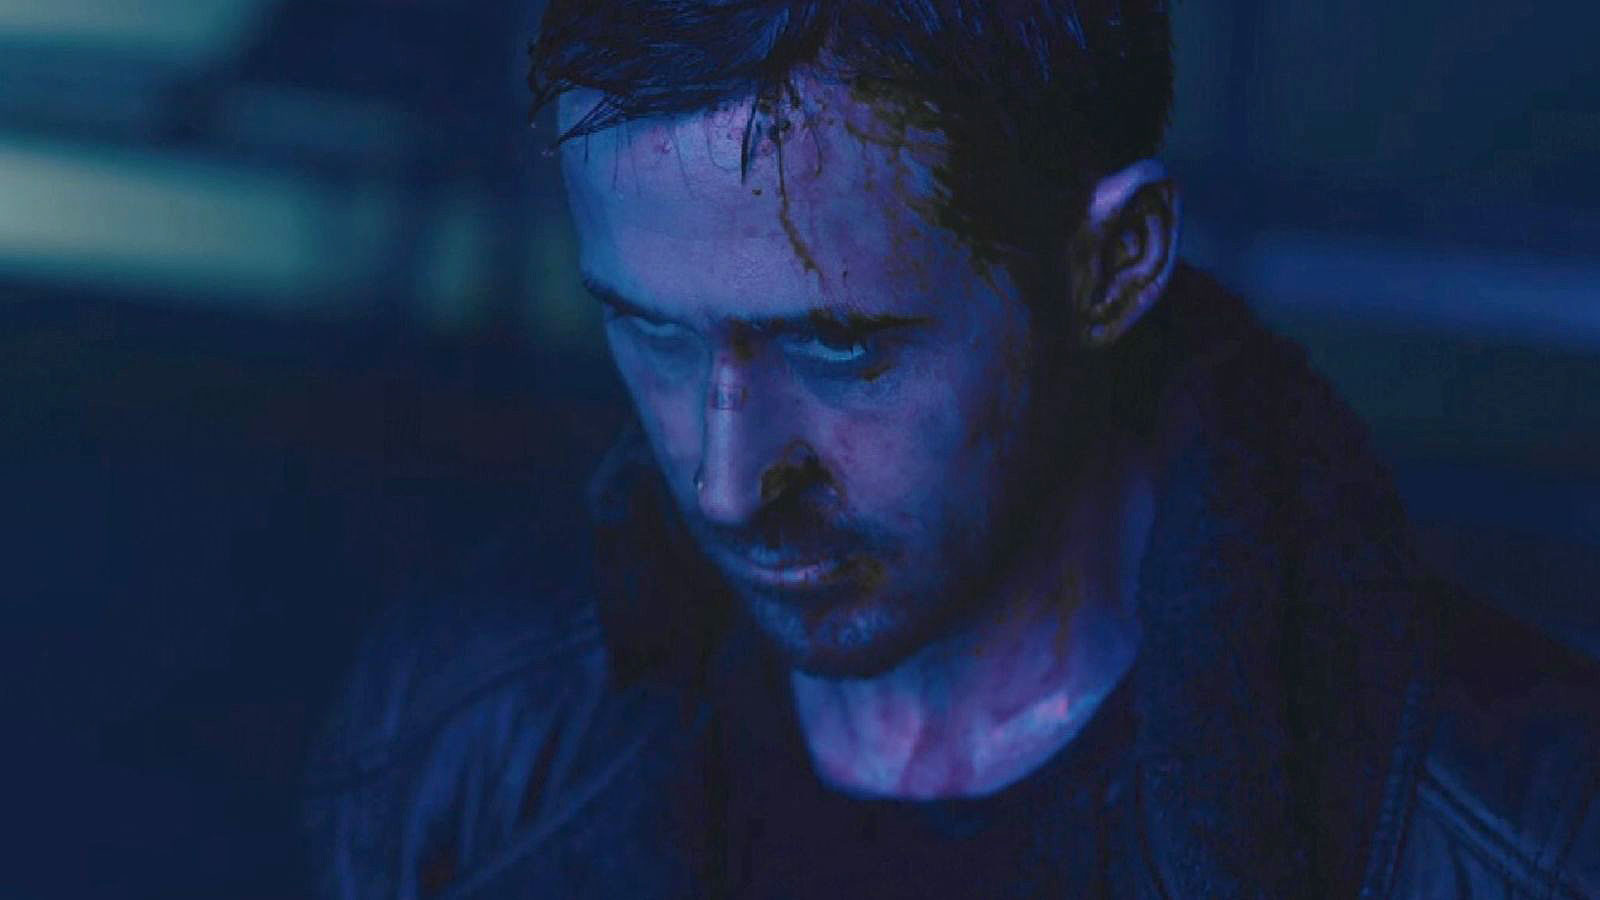 photo image New 'Blade Runner 2049' trailer teases more of Deckard's story